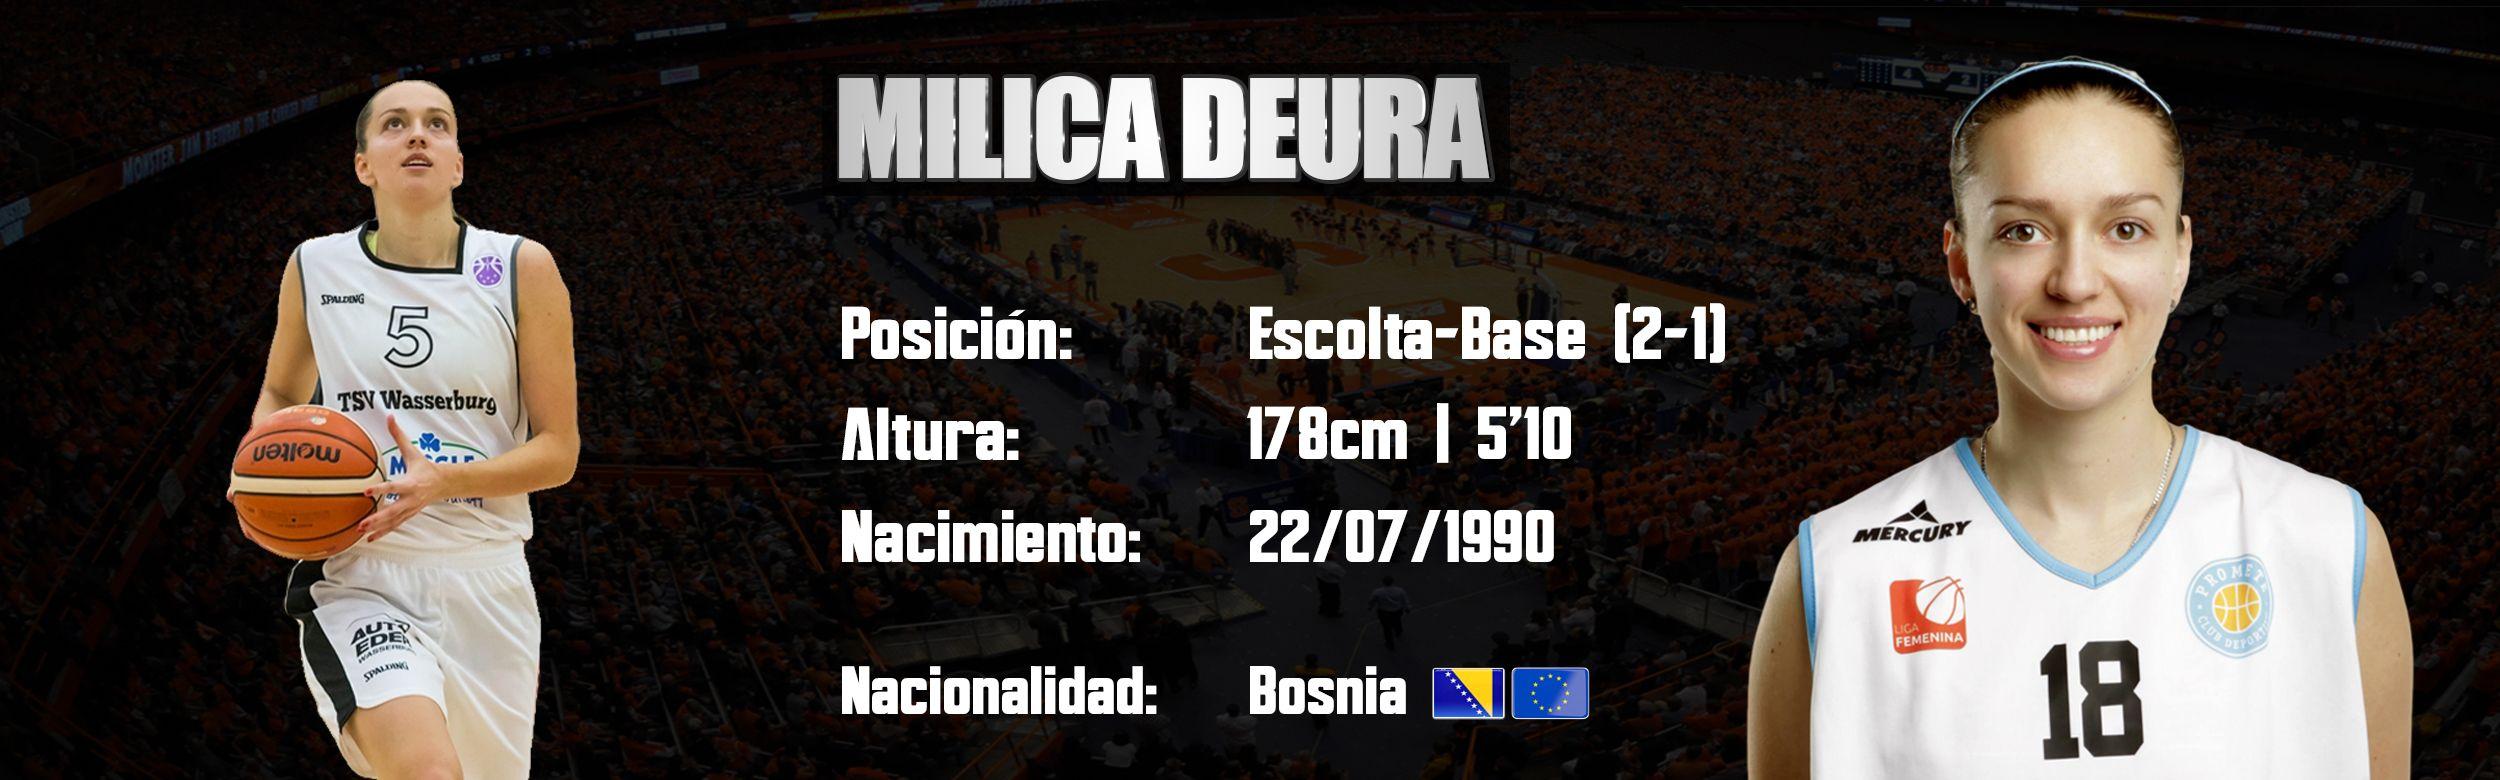 Milica Deura